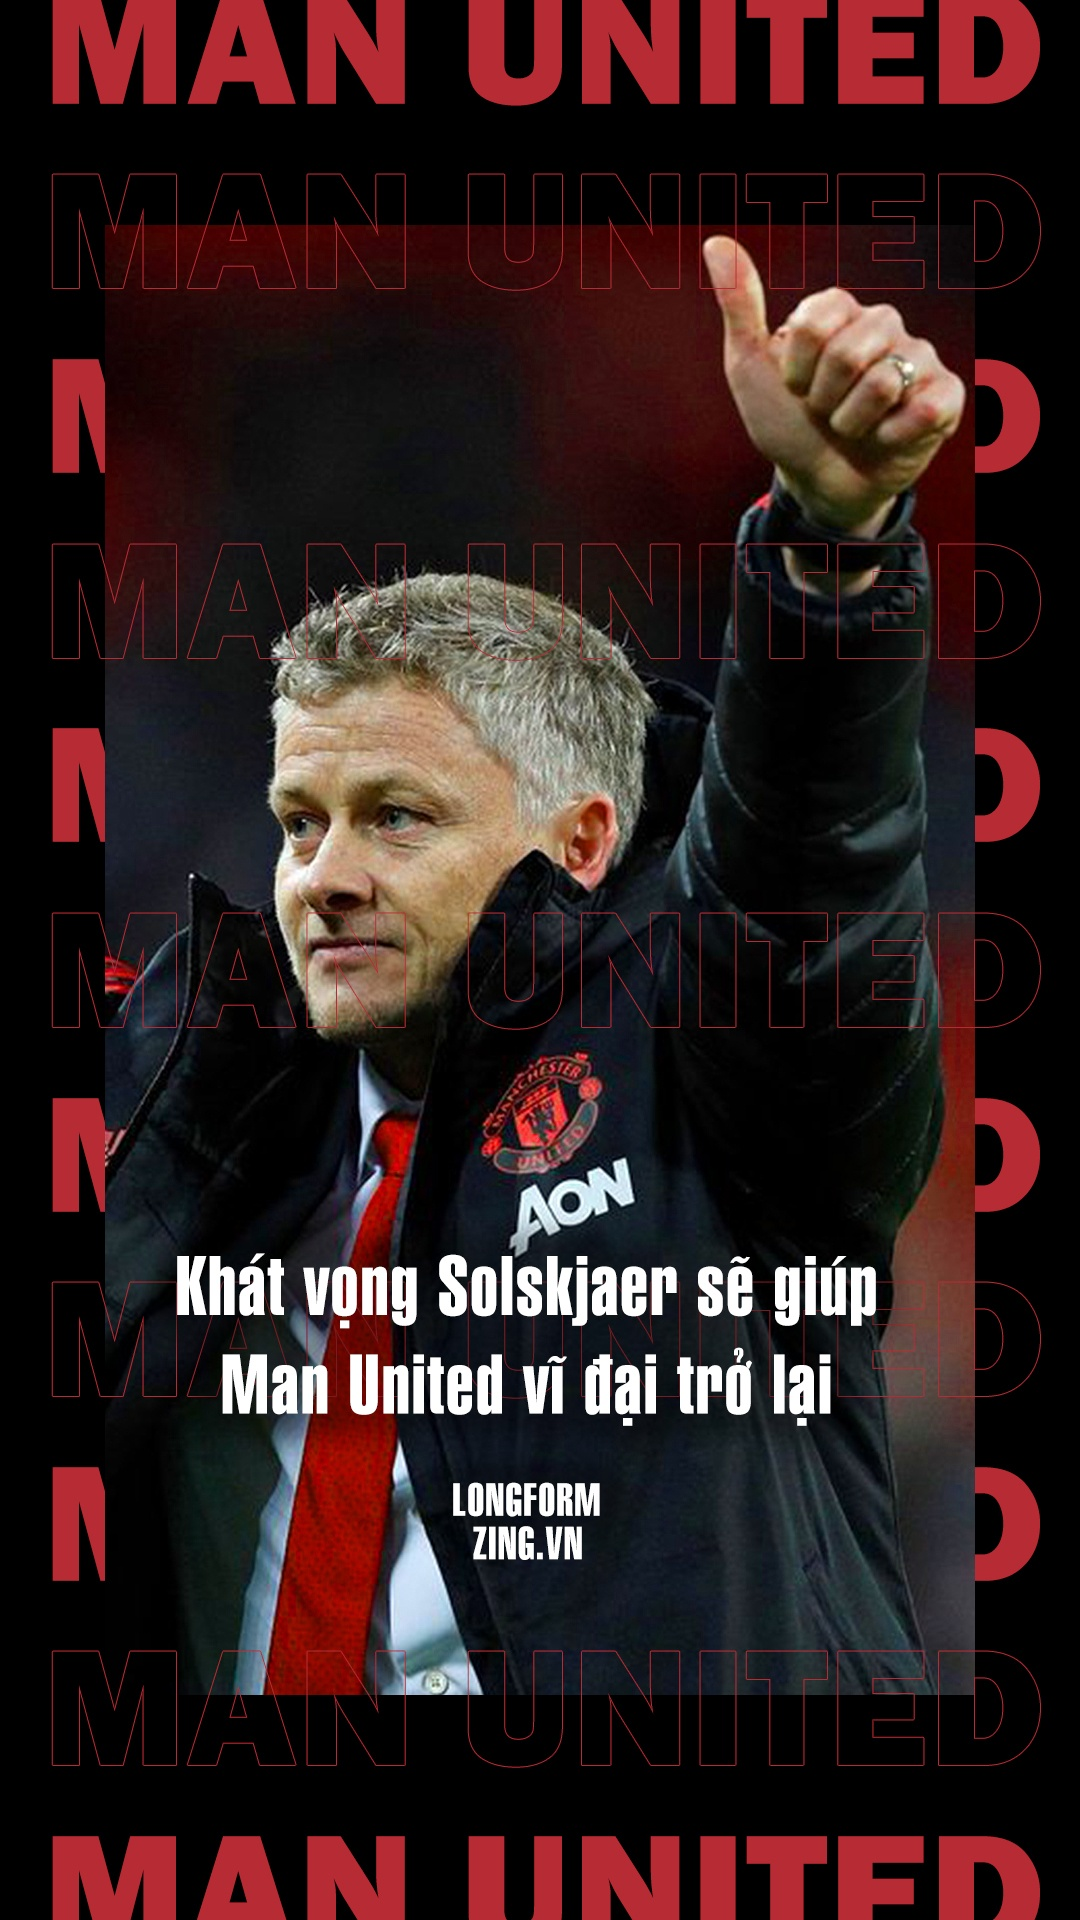 Khat vong cua Solskjaer se giup Man United vi dai tro lai hinh anh 1